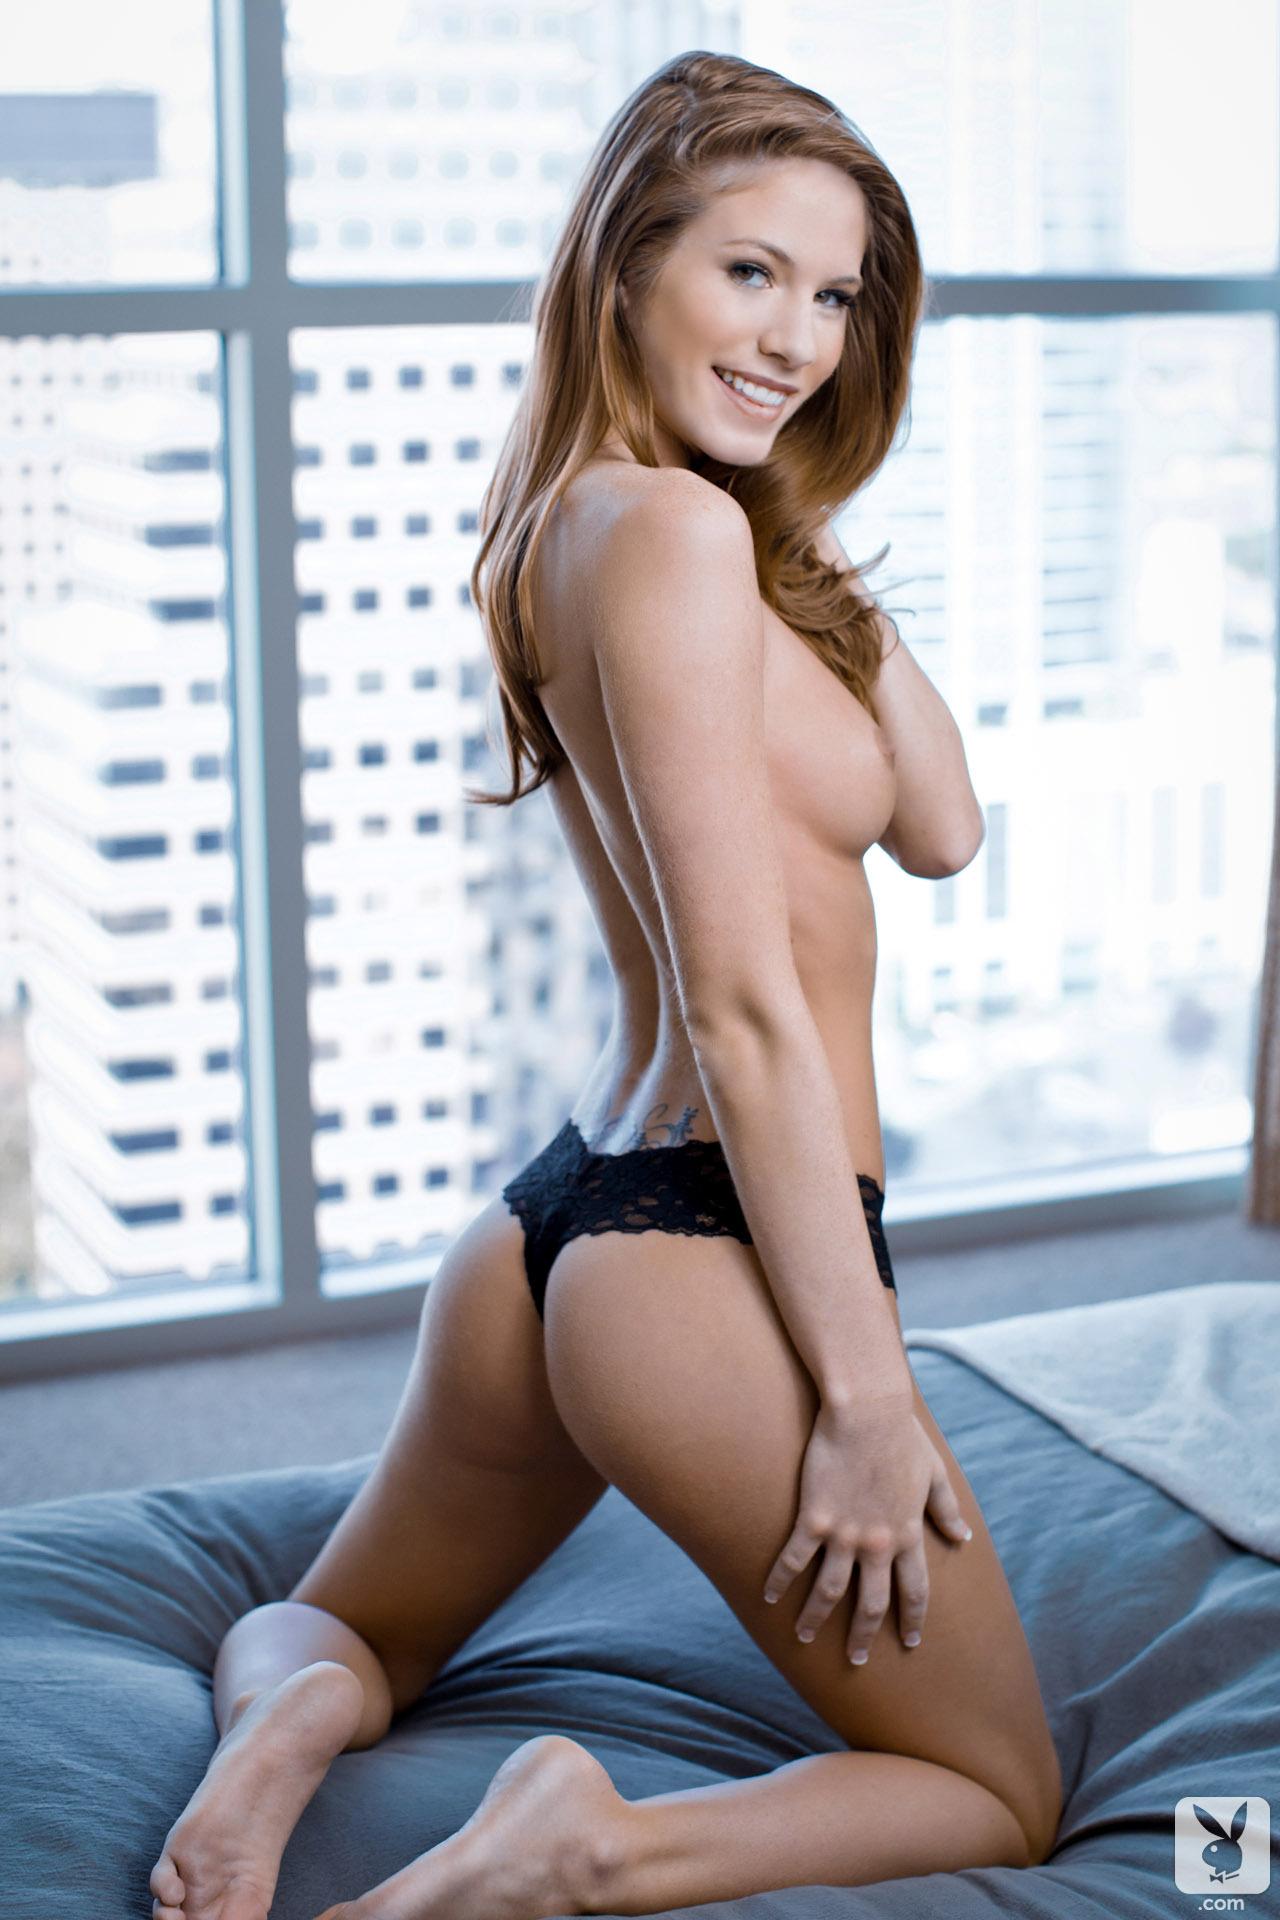 bree-morgan-nude-apartment-redhead-playboy-08